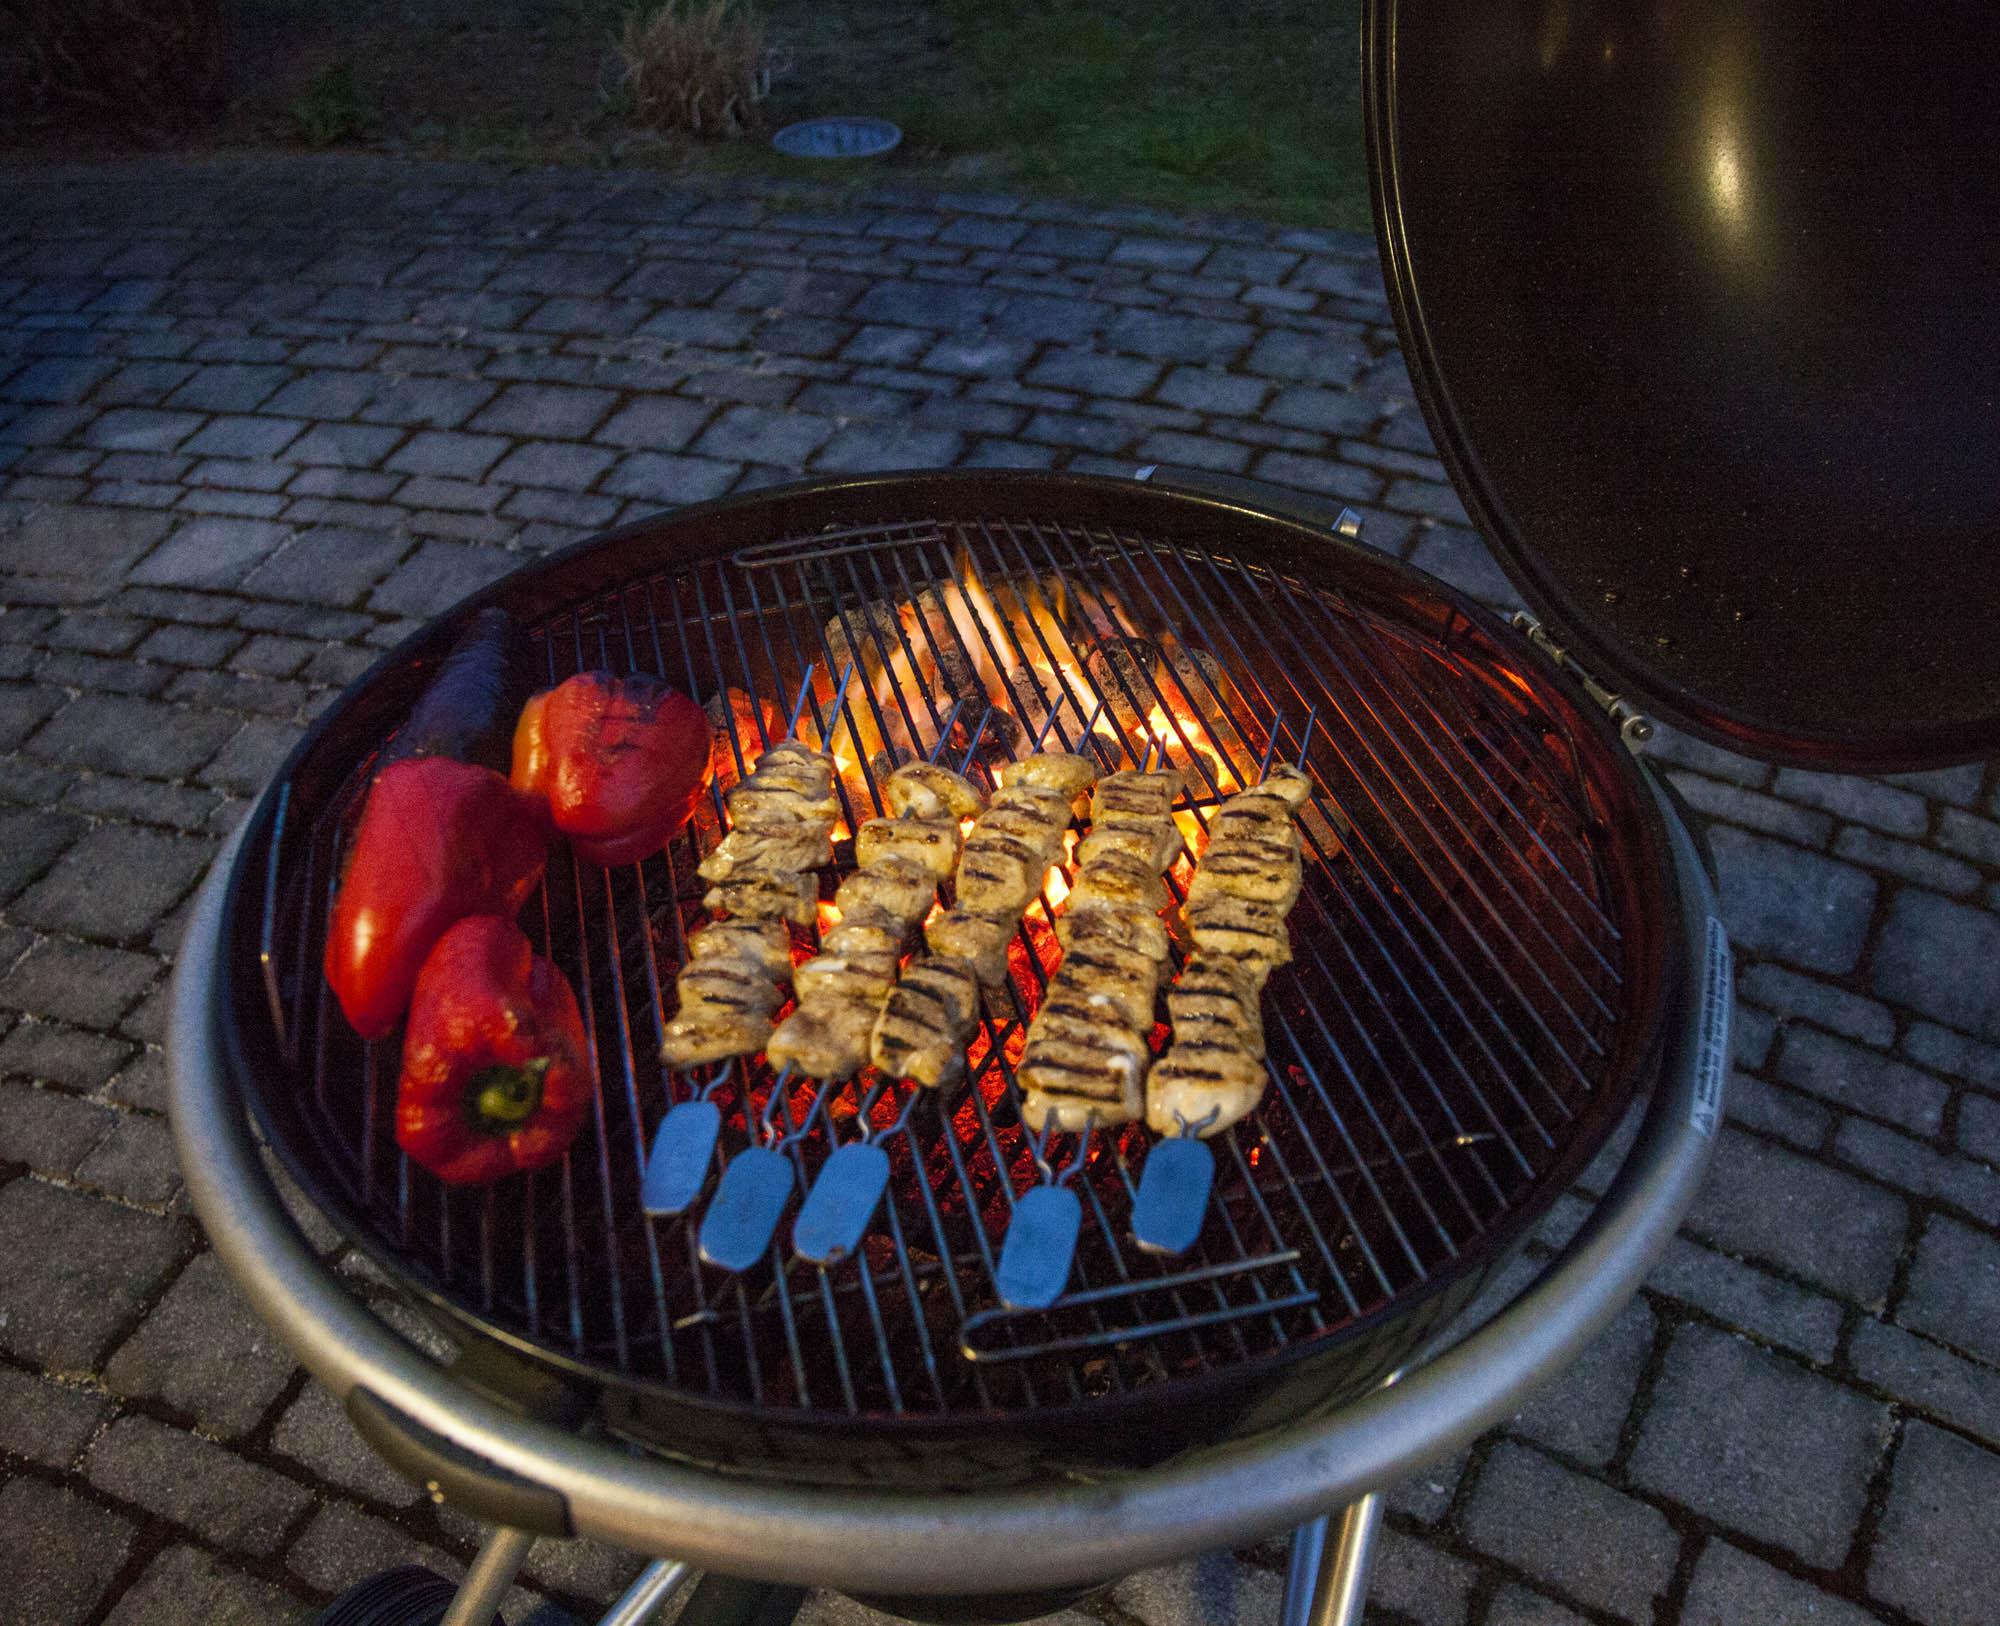 Pulled Pork Gasgrill Grillsportverein : Outdoor küche grillsportverein küche aktuell hamburg vanille